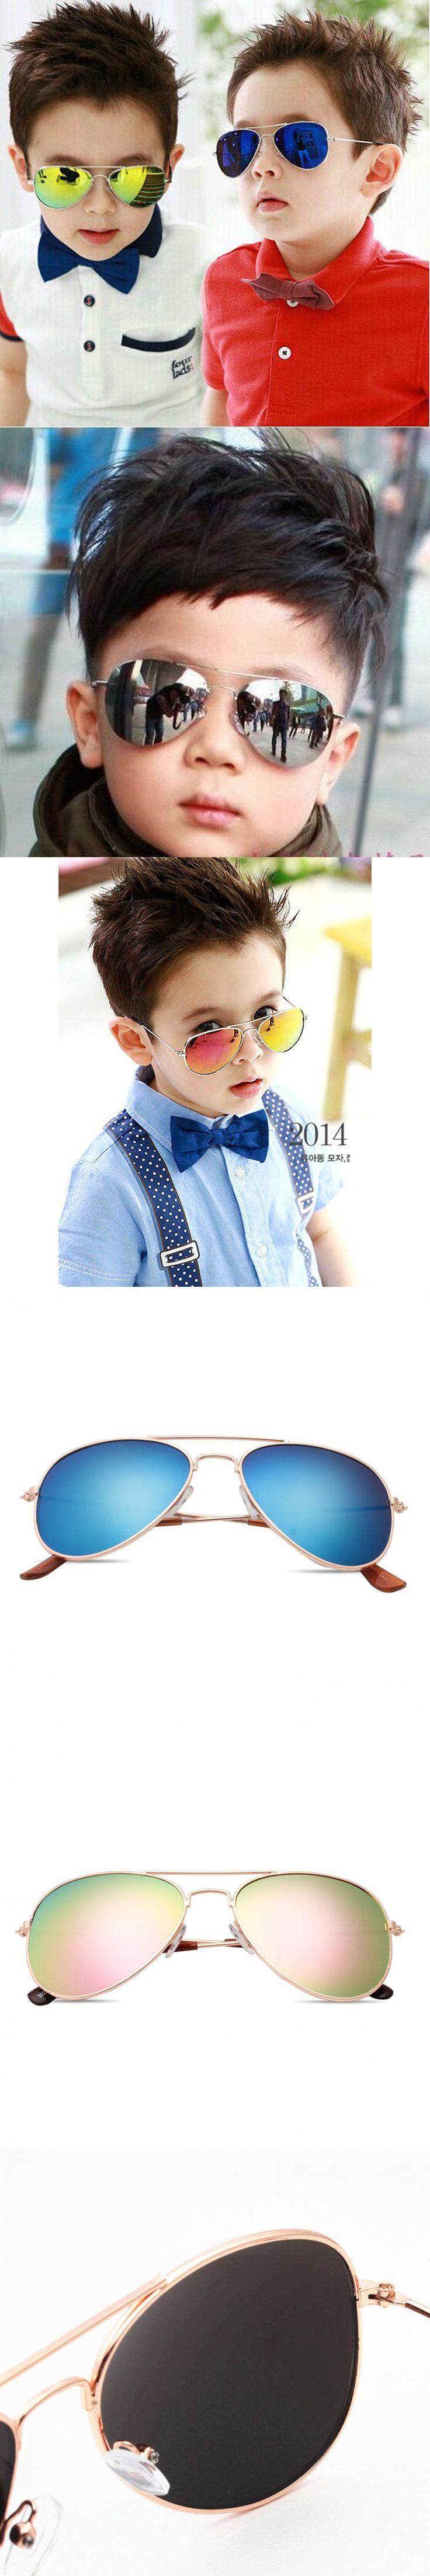 IVE Fashion Baby Boys Kids Sunglasses Piolt Style Brand Design Children Sun Glasses 100%UV Protection Oculos De Sol Gafas 3026